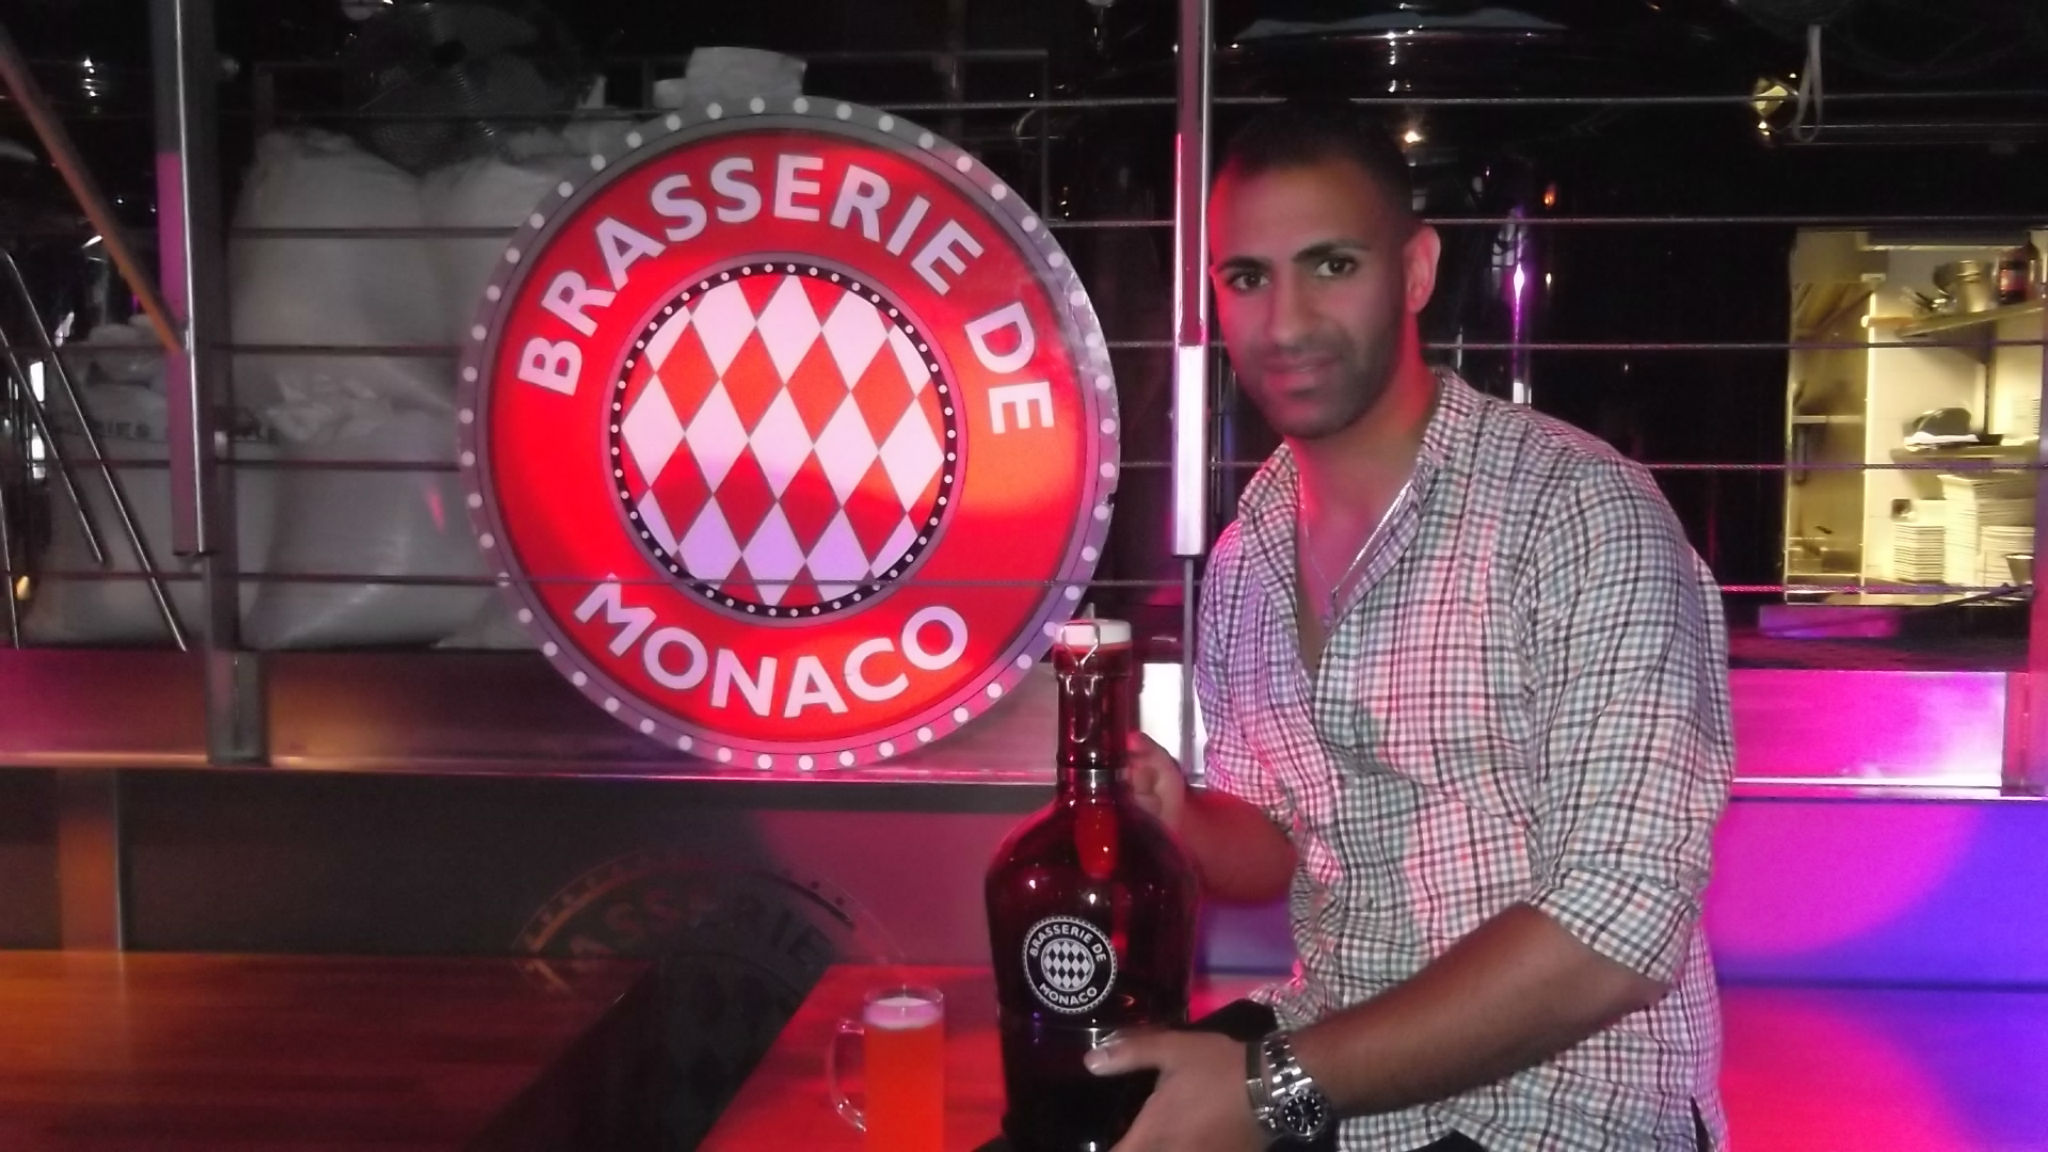 brasserie_monaco